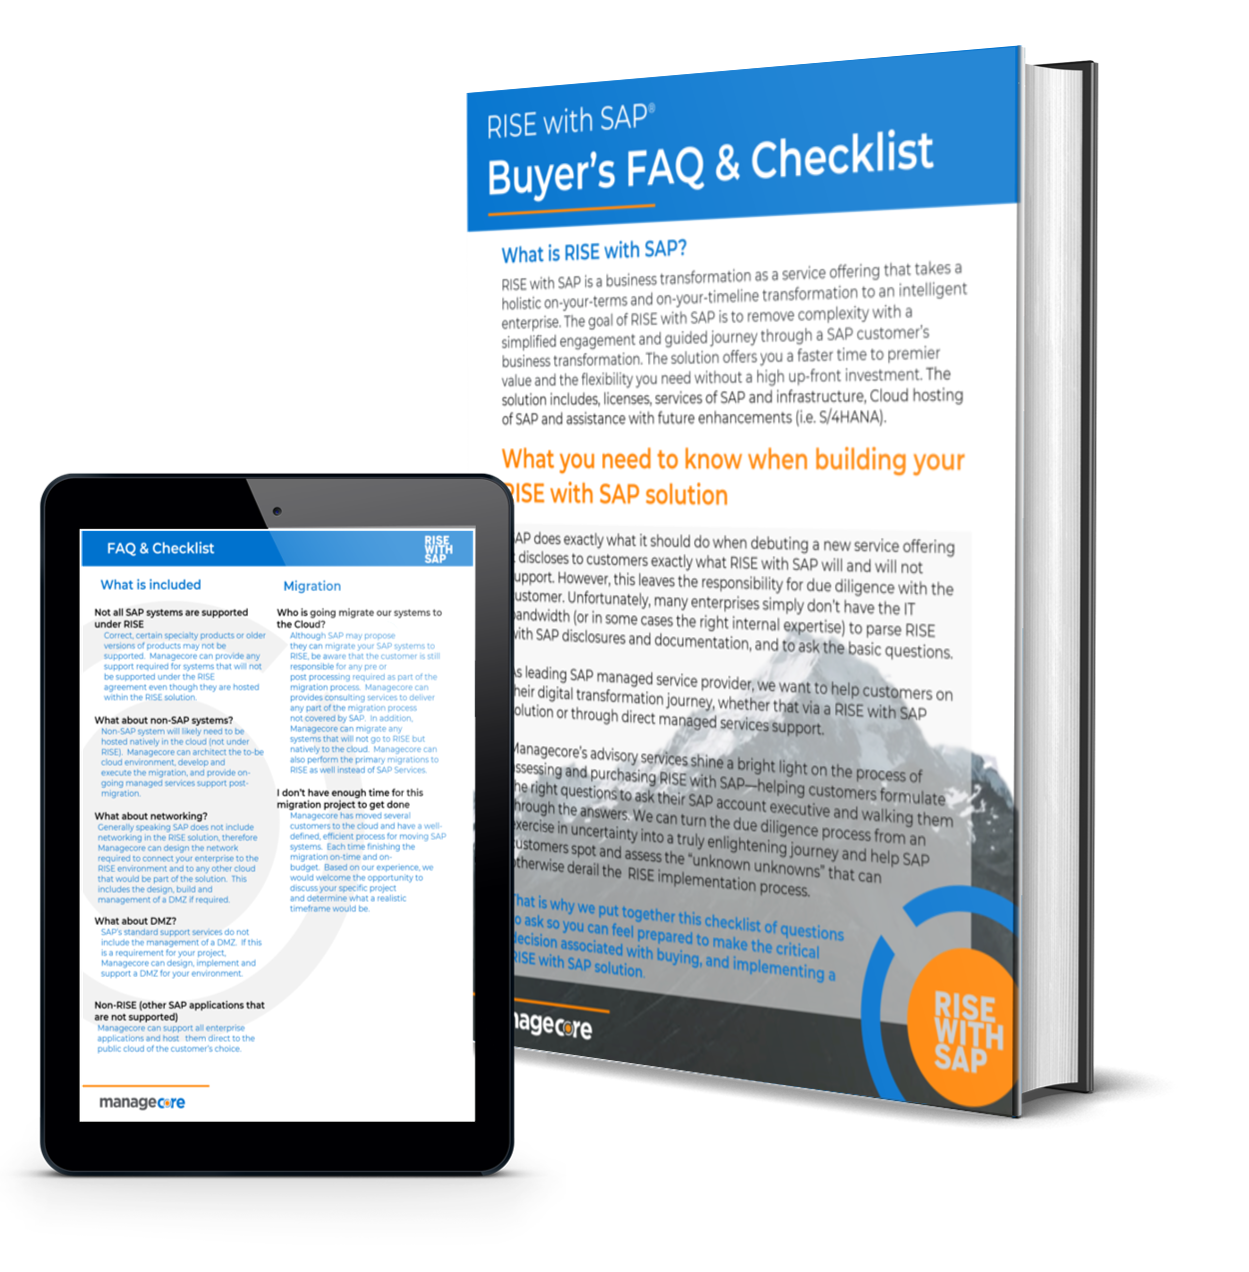 RISE with SAP: Buyer's FAQ & Checklist